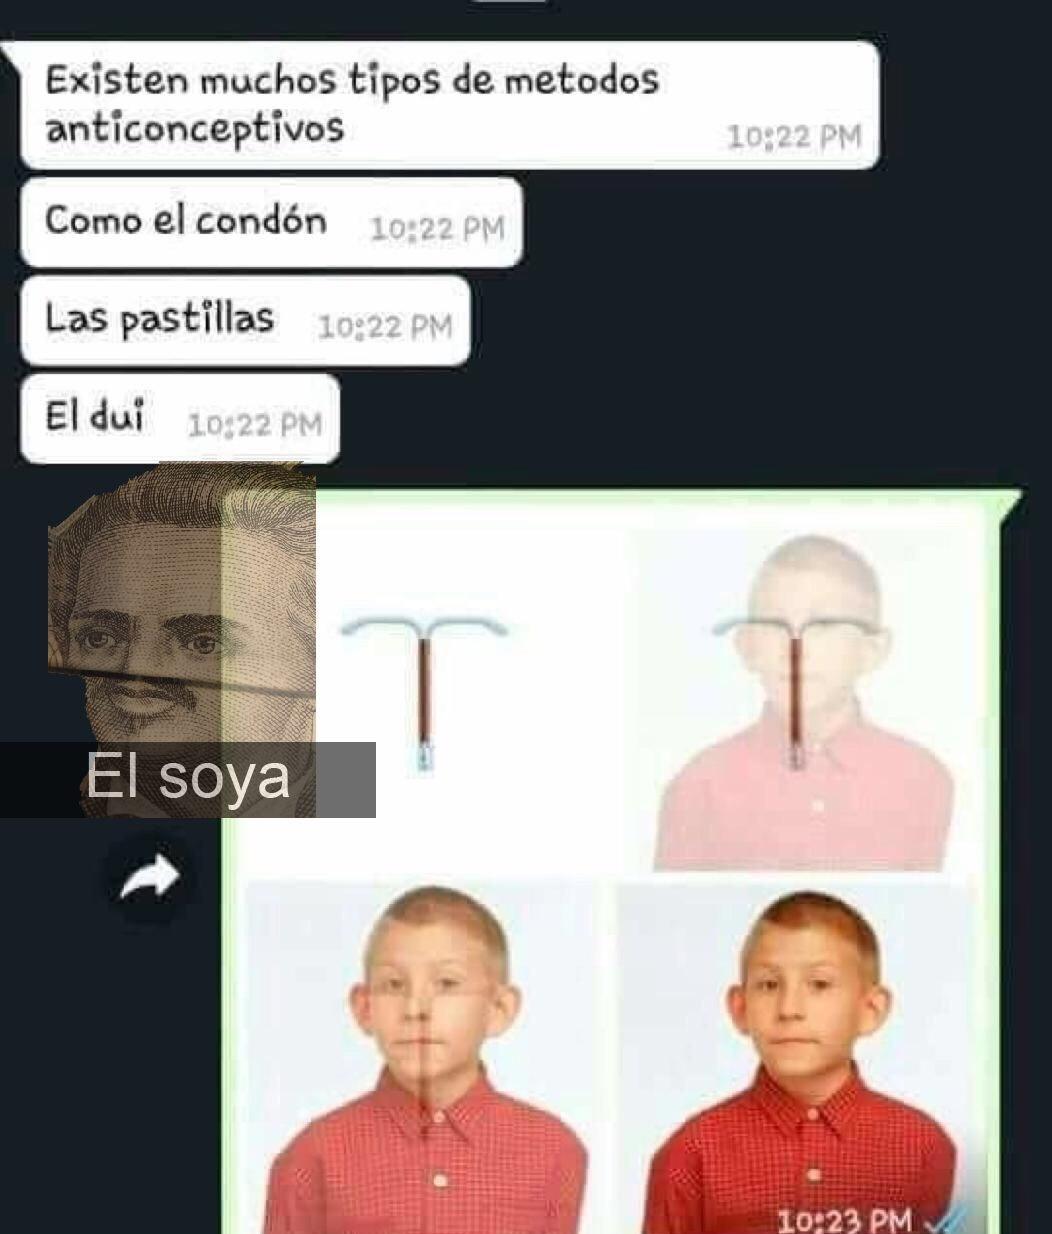 el dui - meme